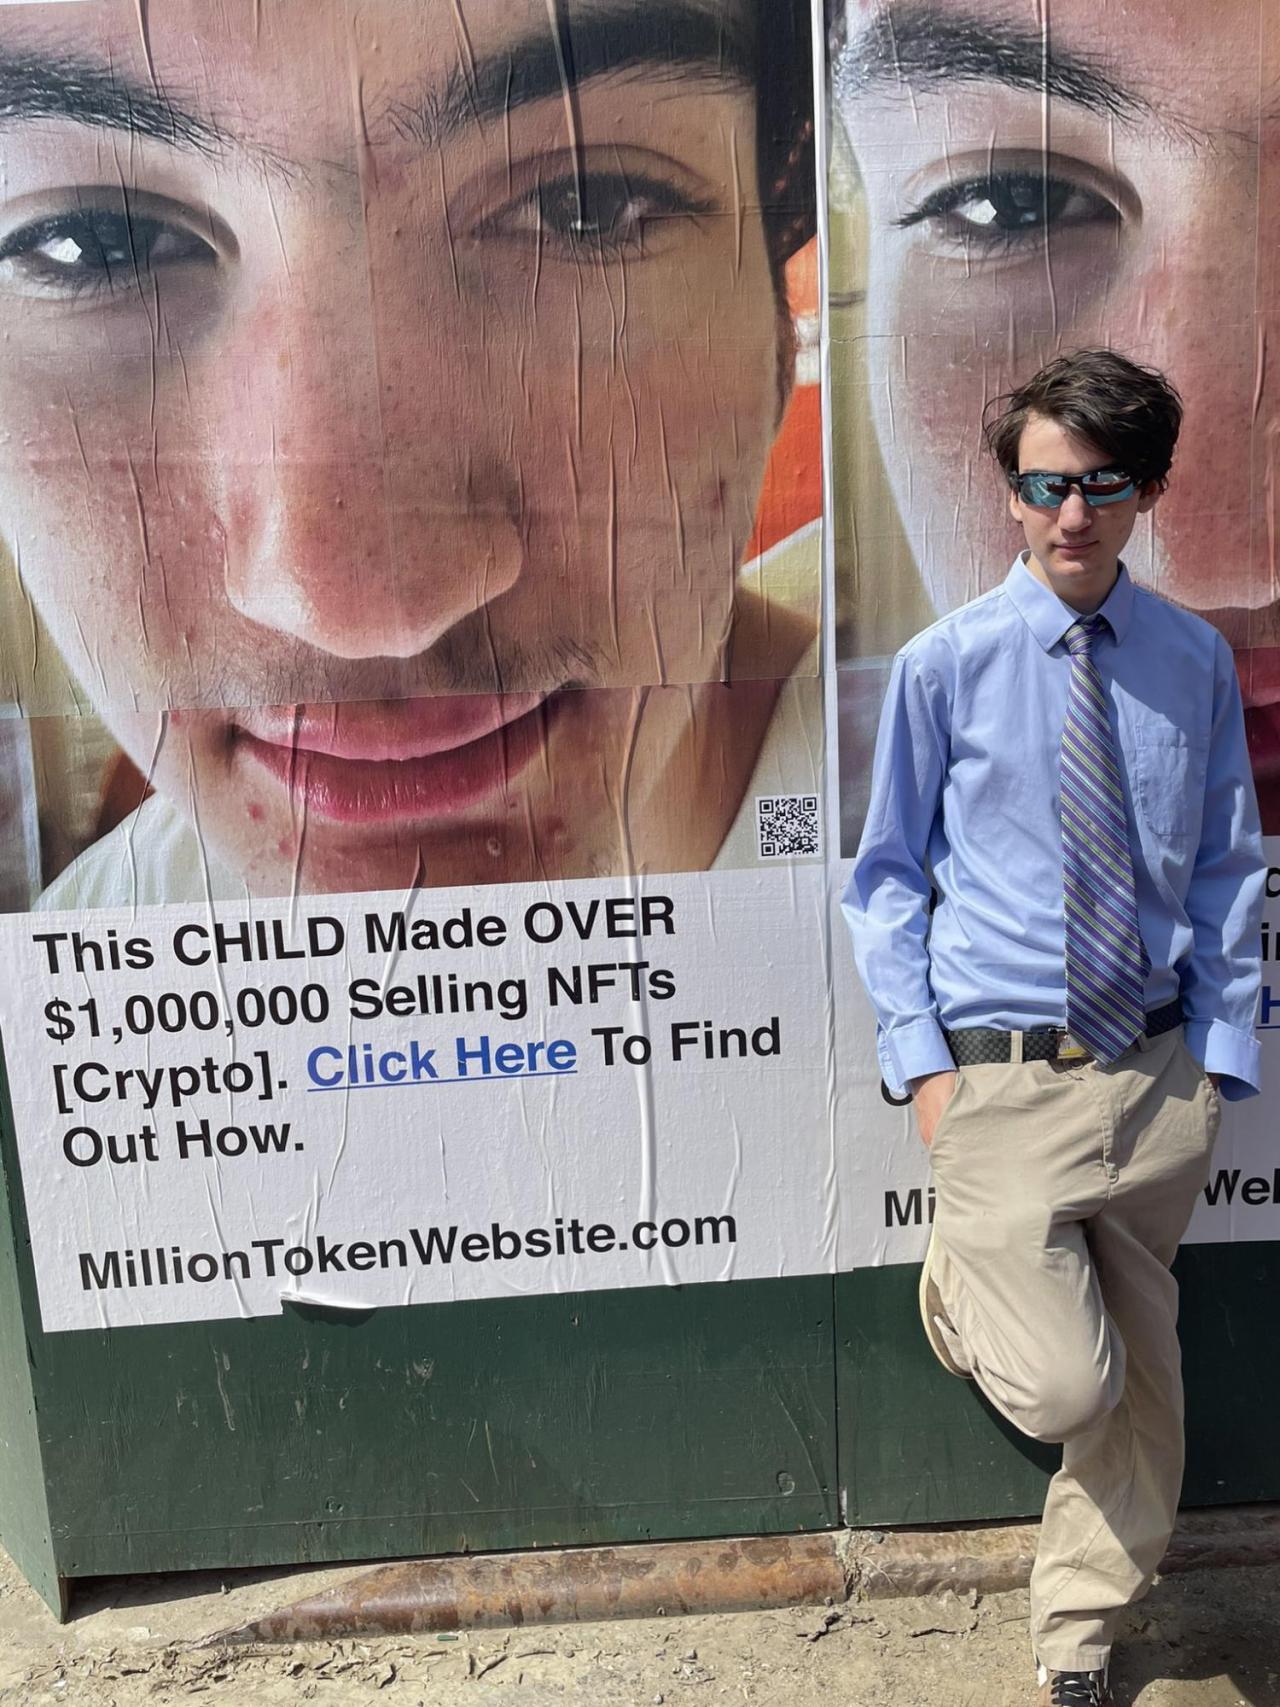 Street campaign for Million Token Website